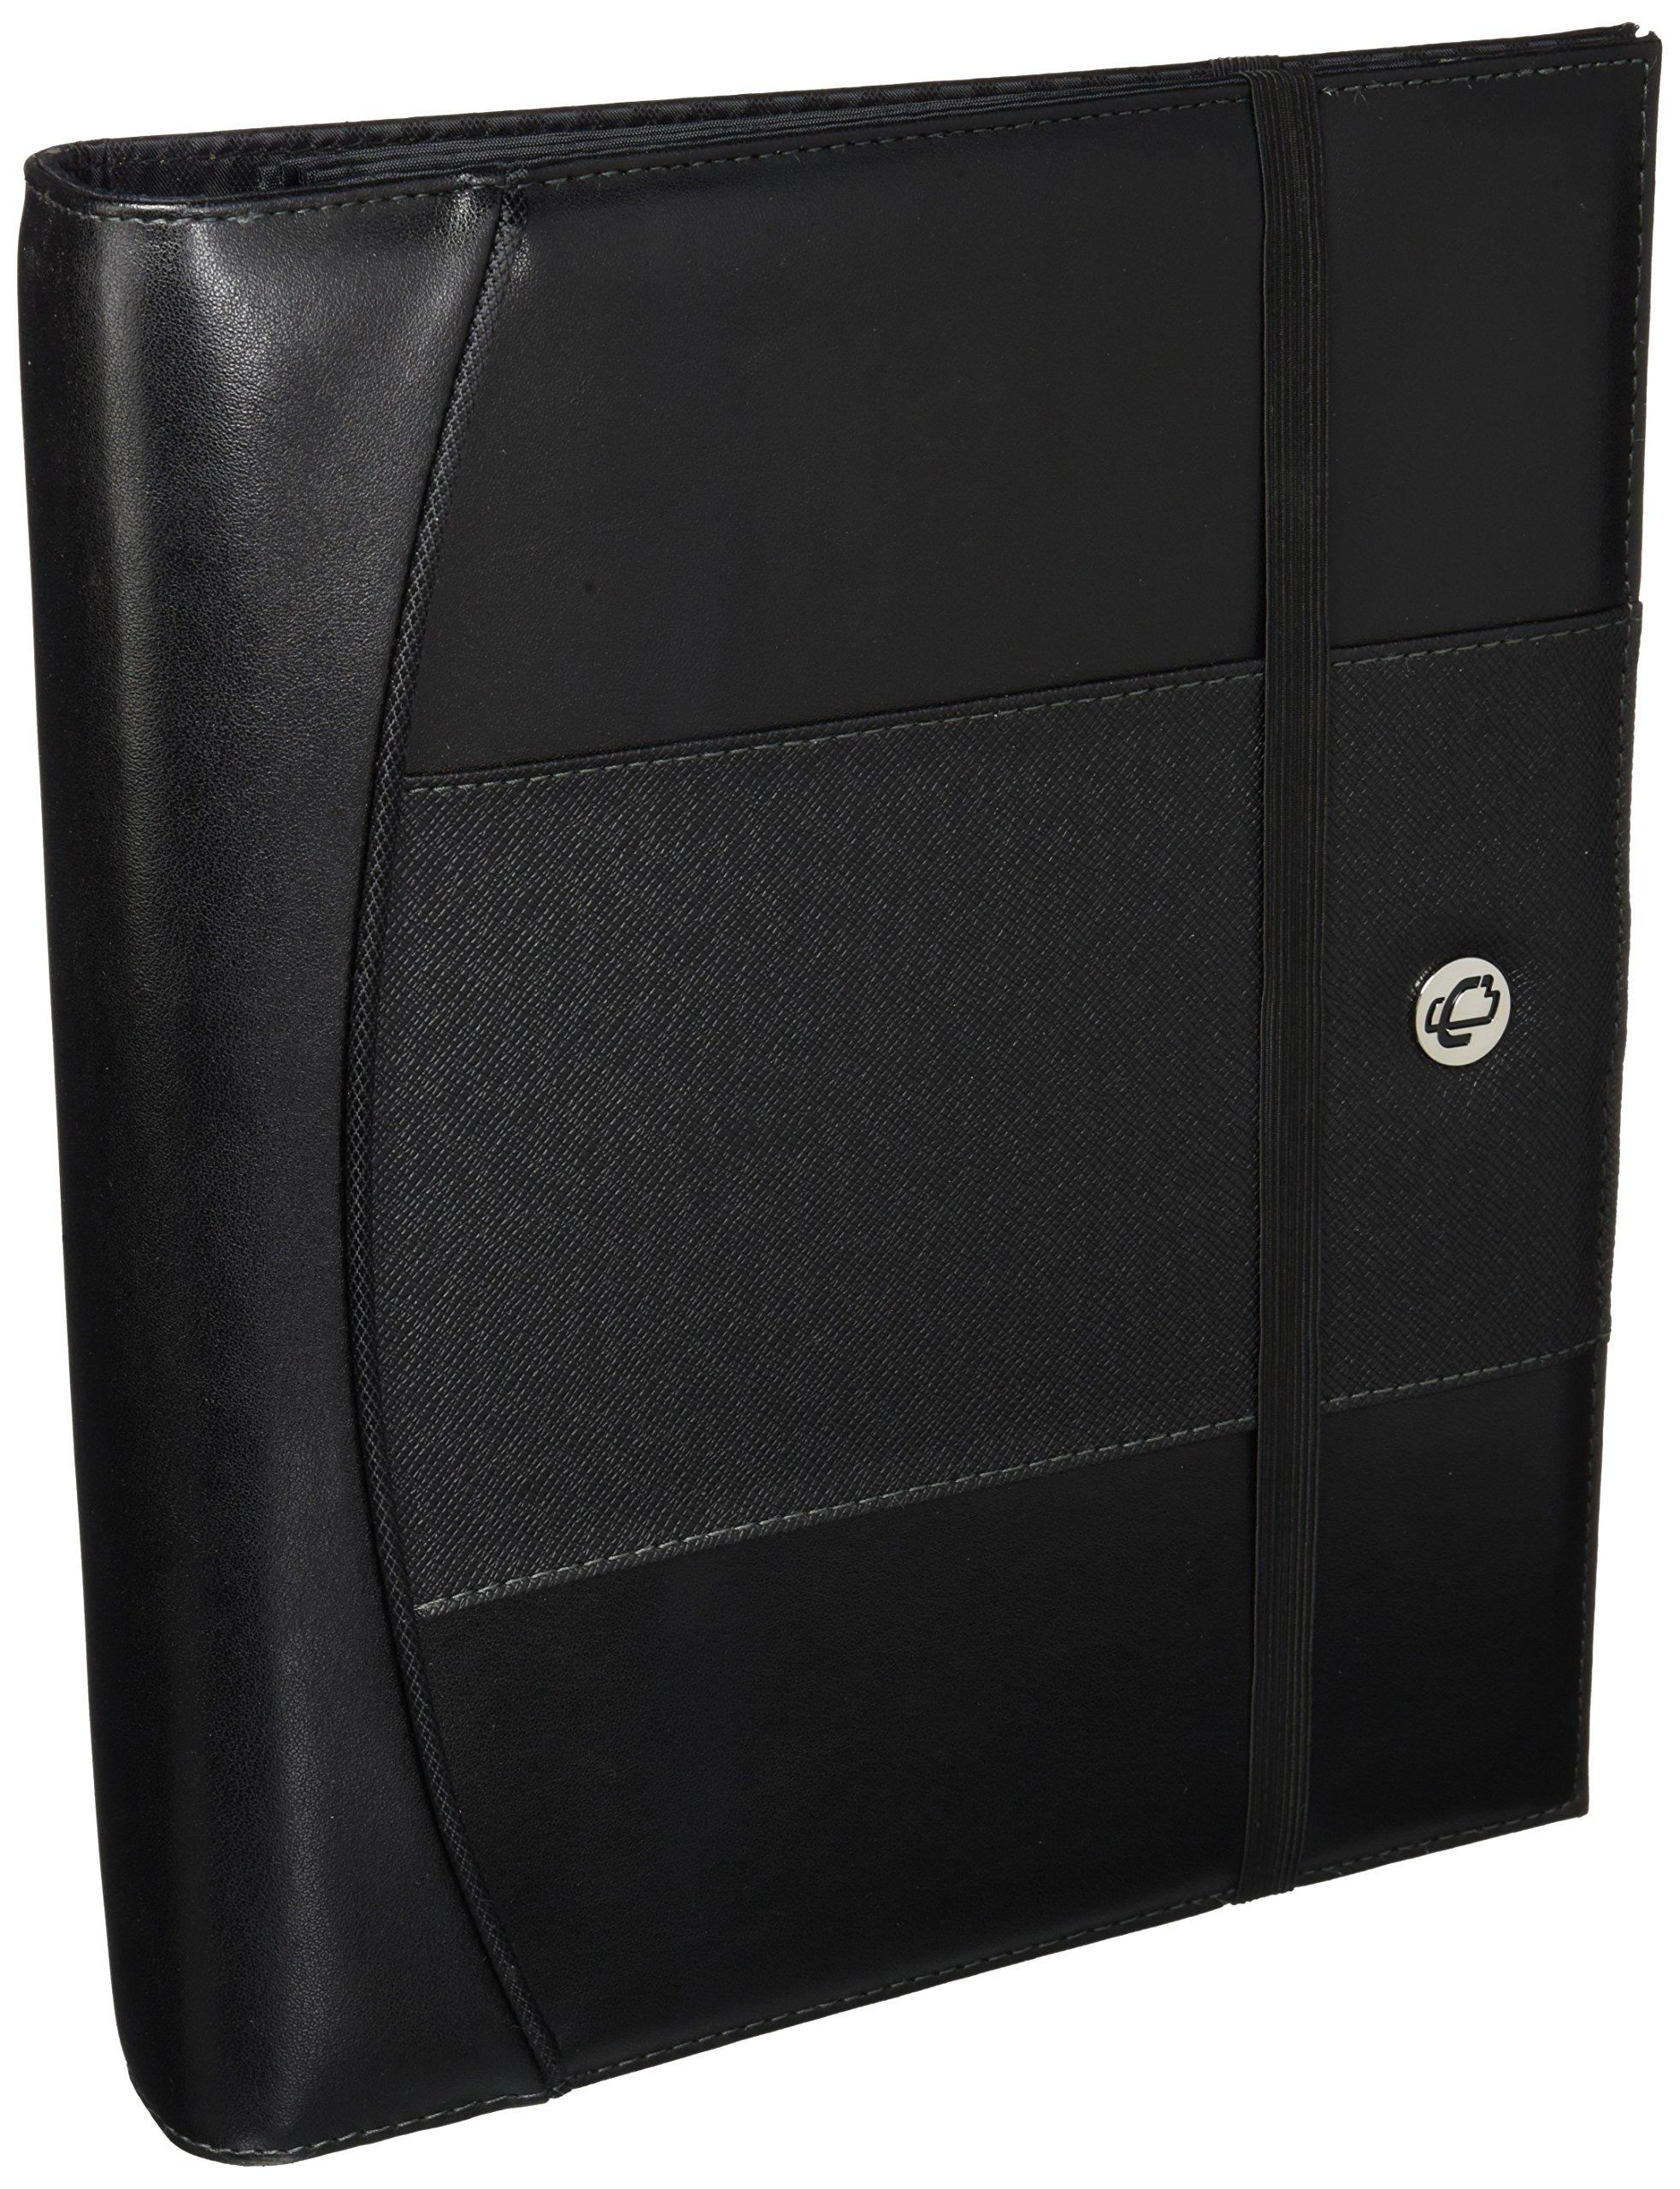 Case-IT 1-inch D-Ring Binder, Elastic Strap Closure, Black (LL-PRO-126)